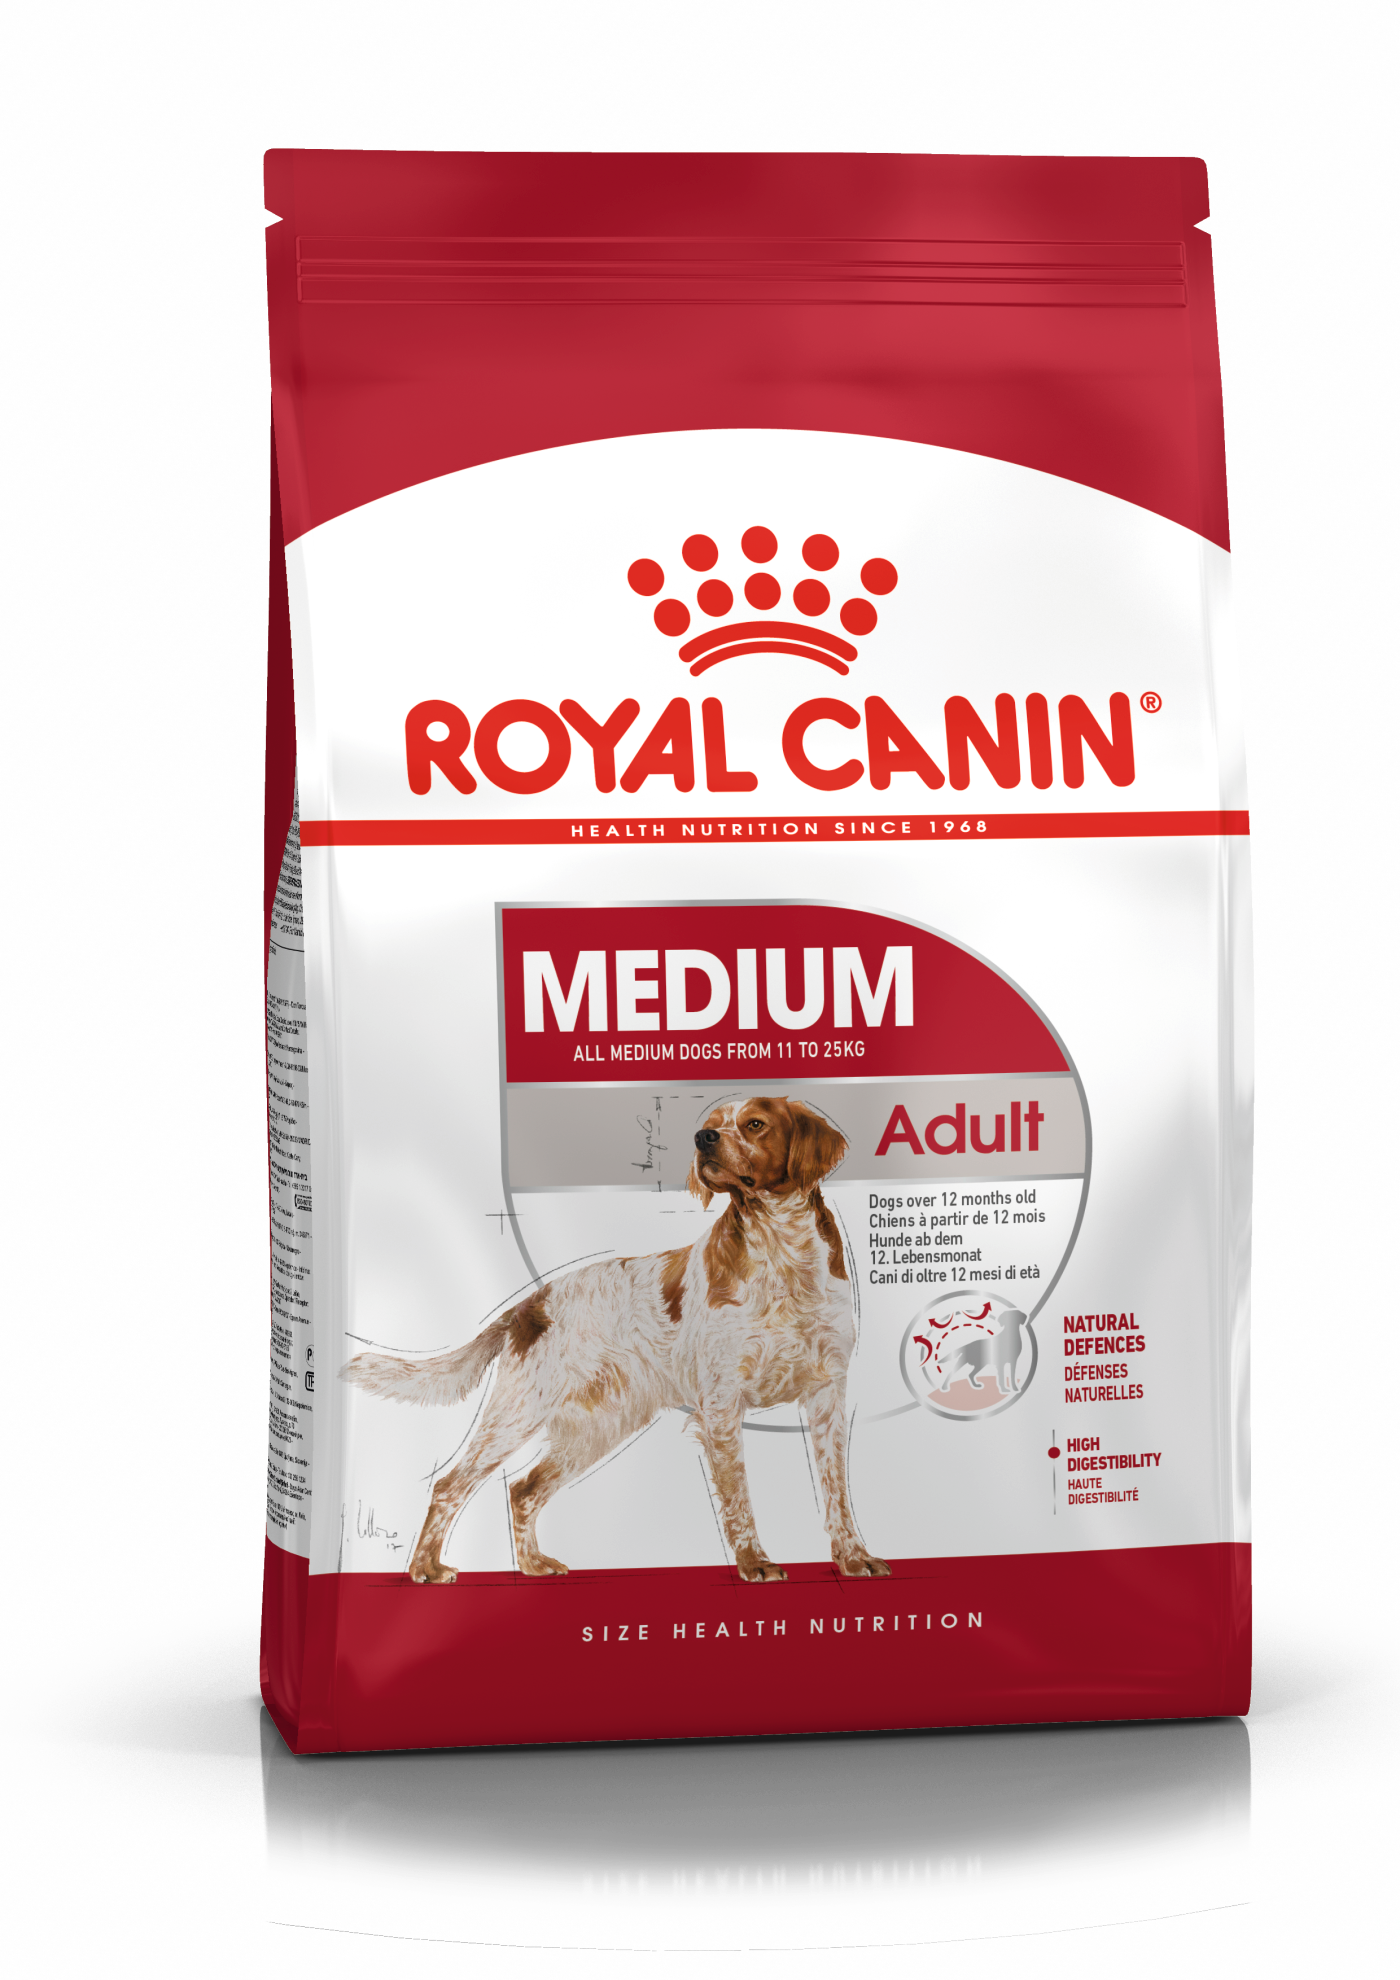 Medium Adult product image